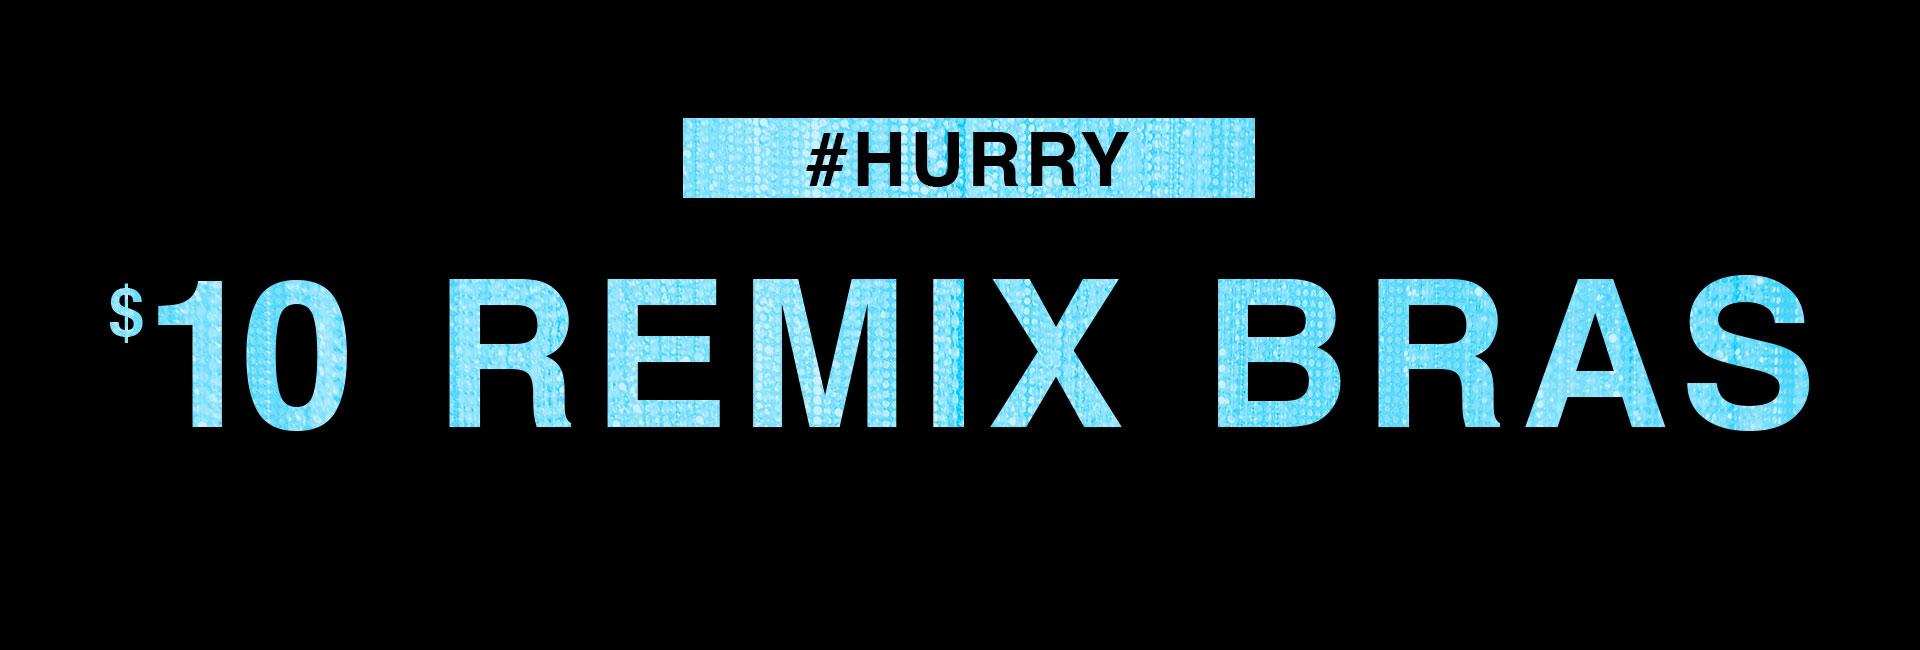 #Hurry. $10 Remix Bras.